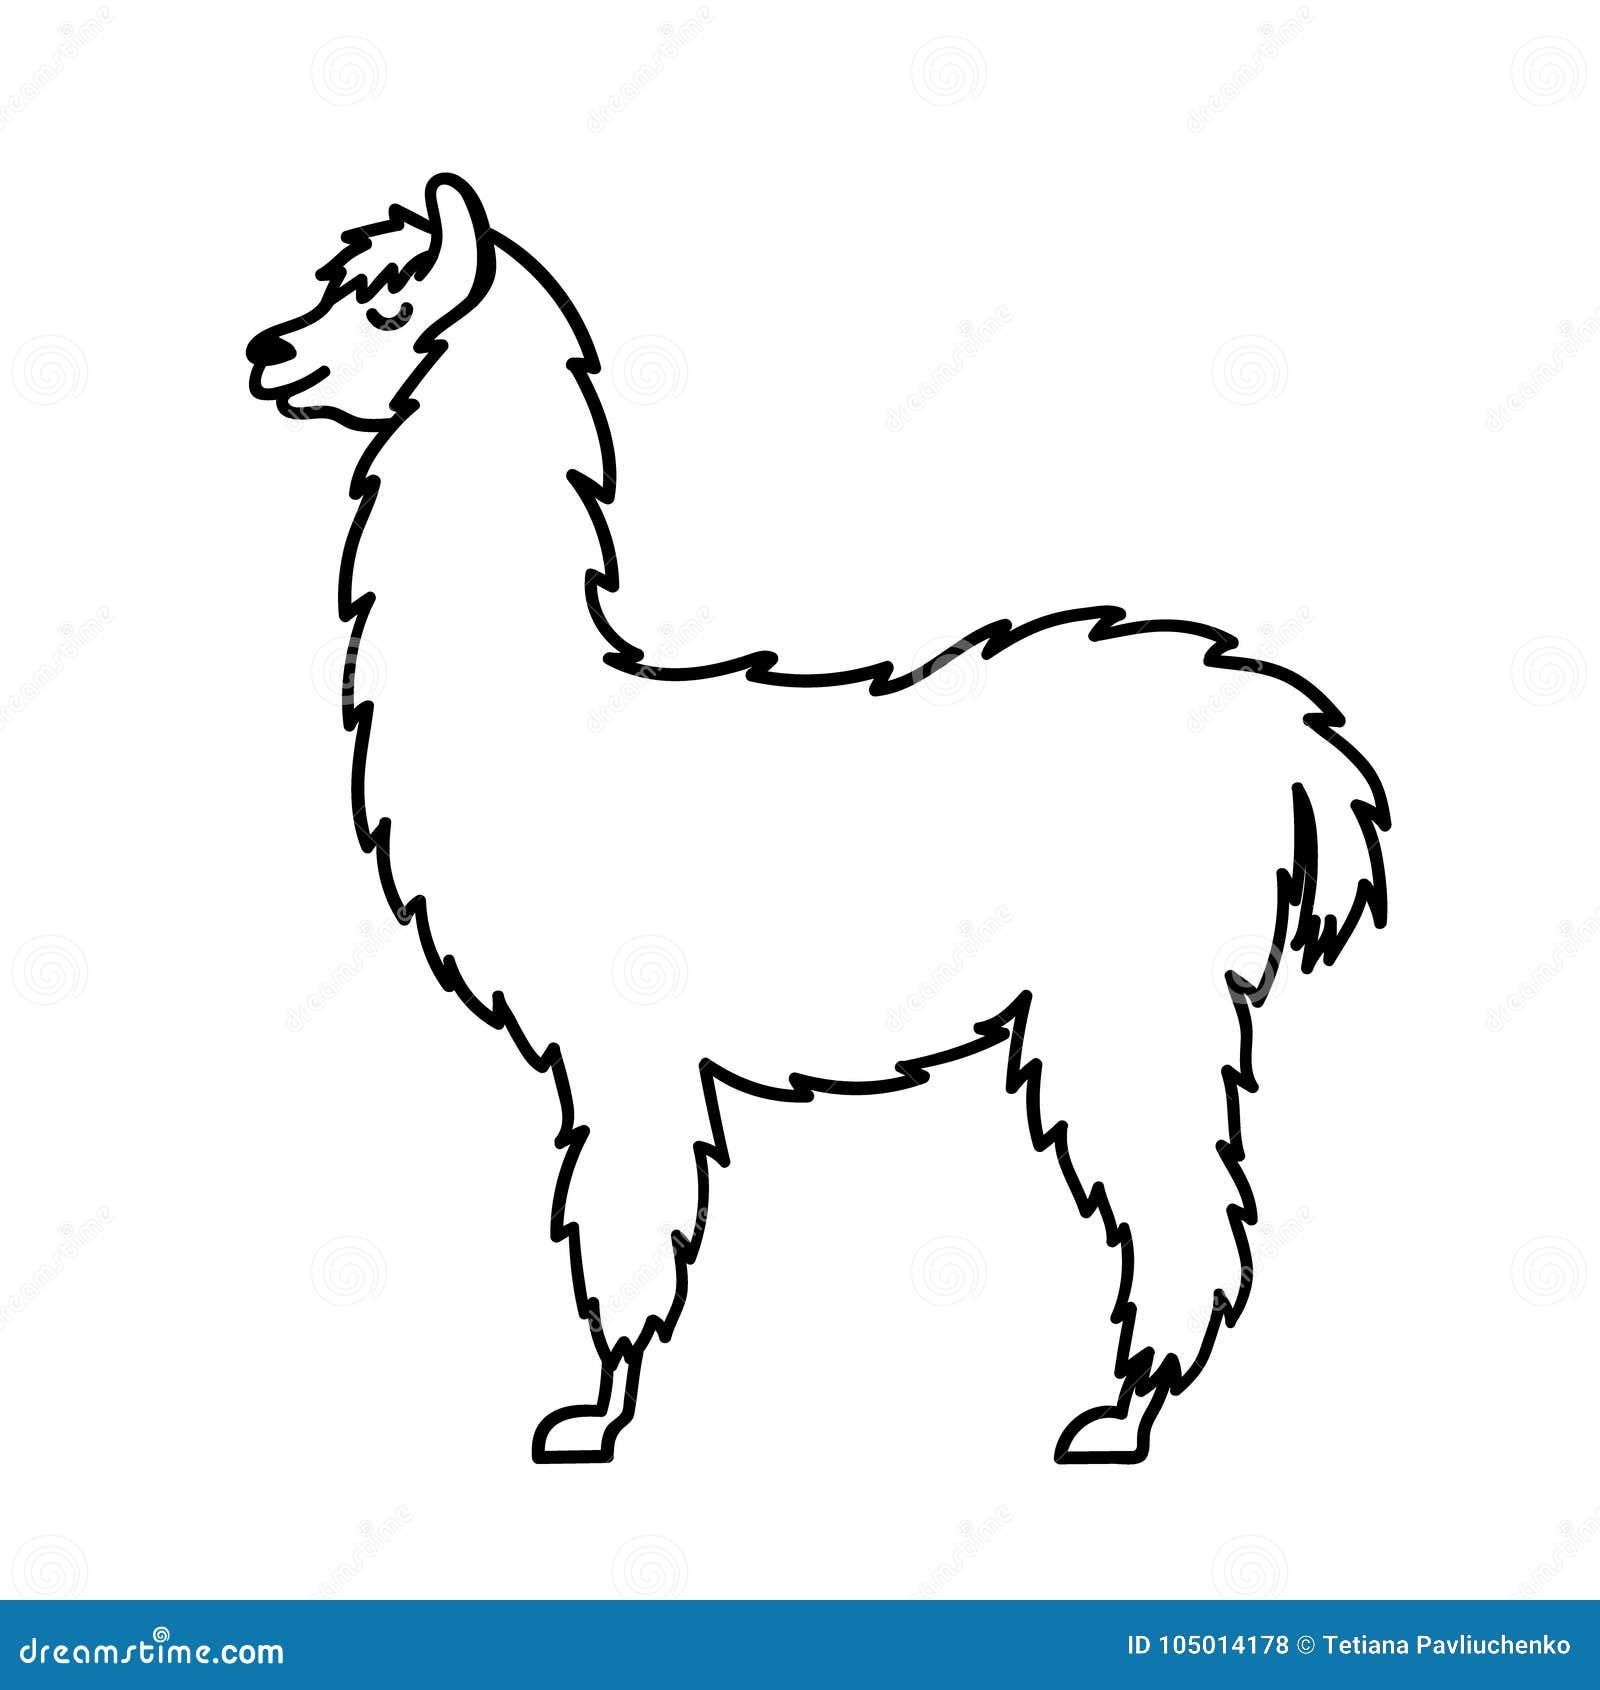 Line Drawing Llama : Isolated outline cartoon baby llama stock vector